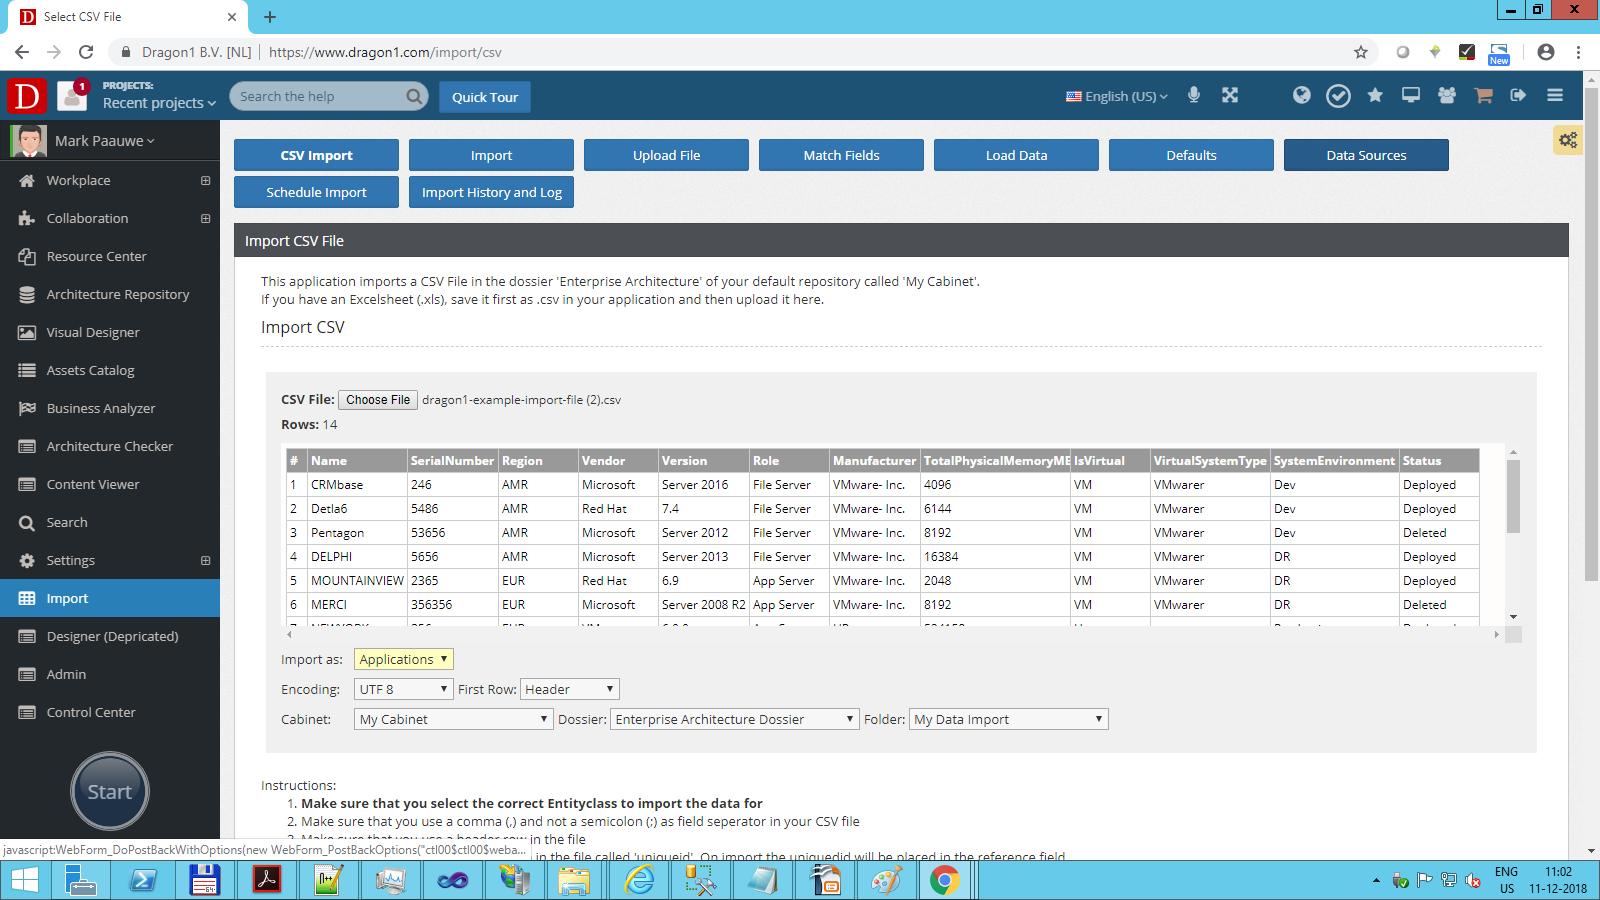 screenshot import application